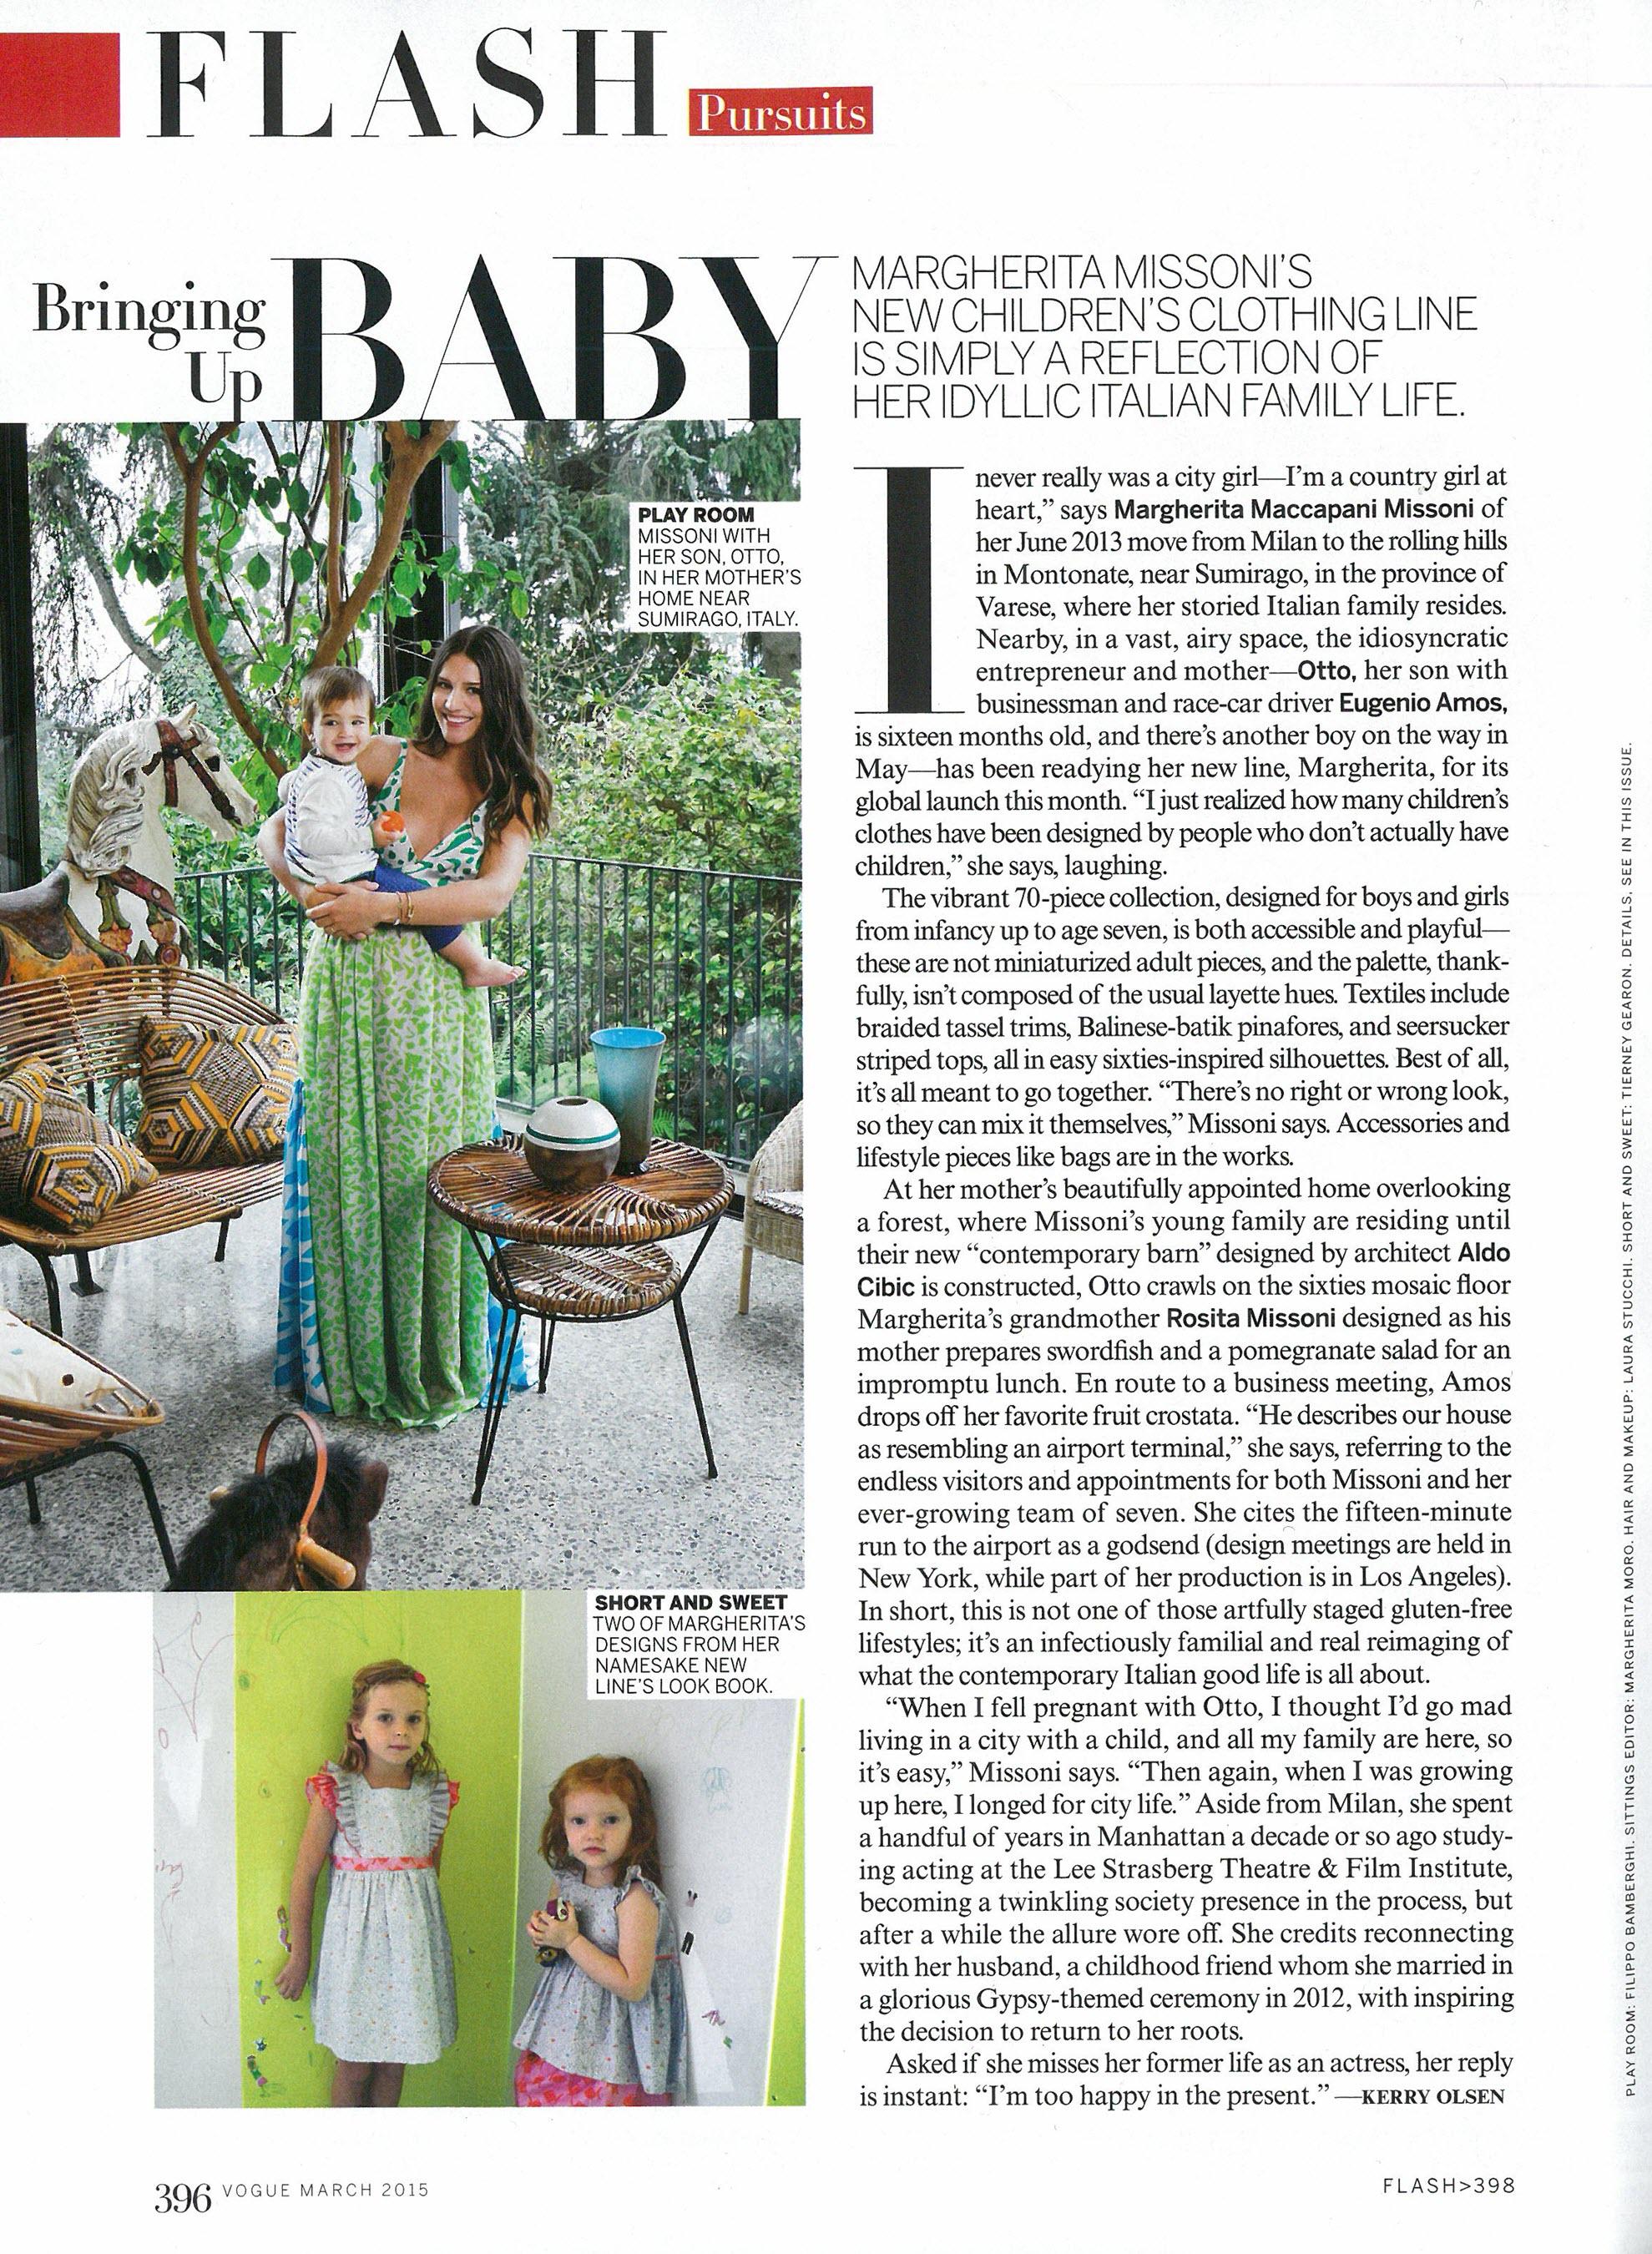 Vogue March 2015 pg.396 copy.jpg